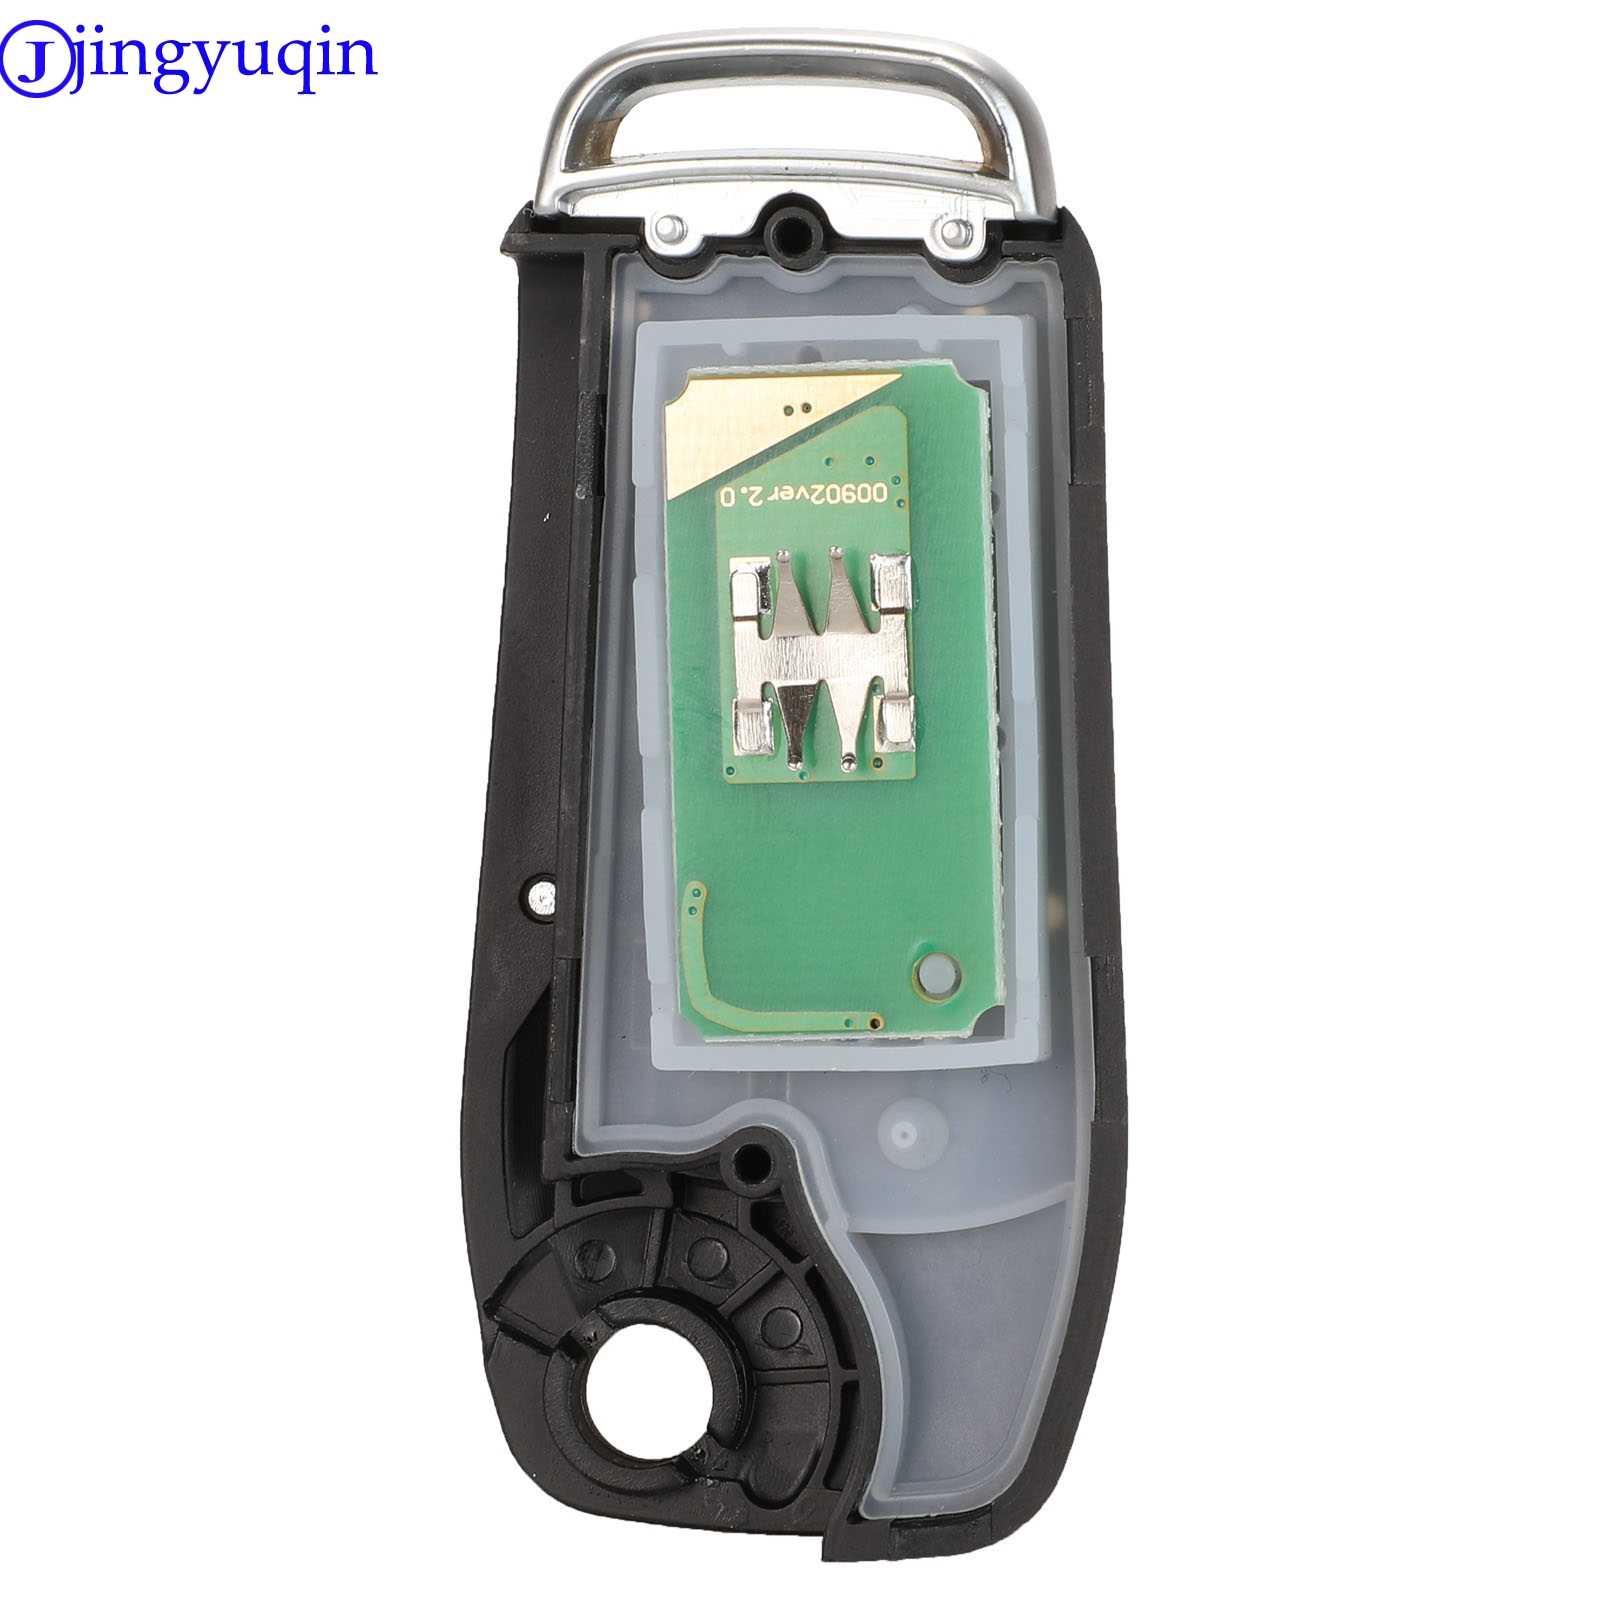 Jingyuqin للطي حافظة مفتاح بعيد غطاء للفورد فييستا التركيز 2 Ecosport كوغا الهروب C ماكس كا 3 أزرار مفتاح فوب HU101 / FO21